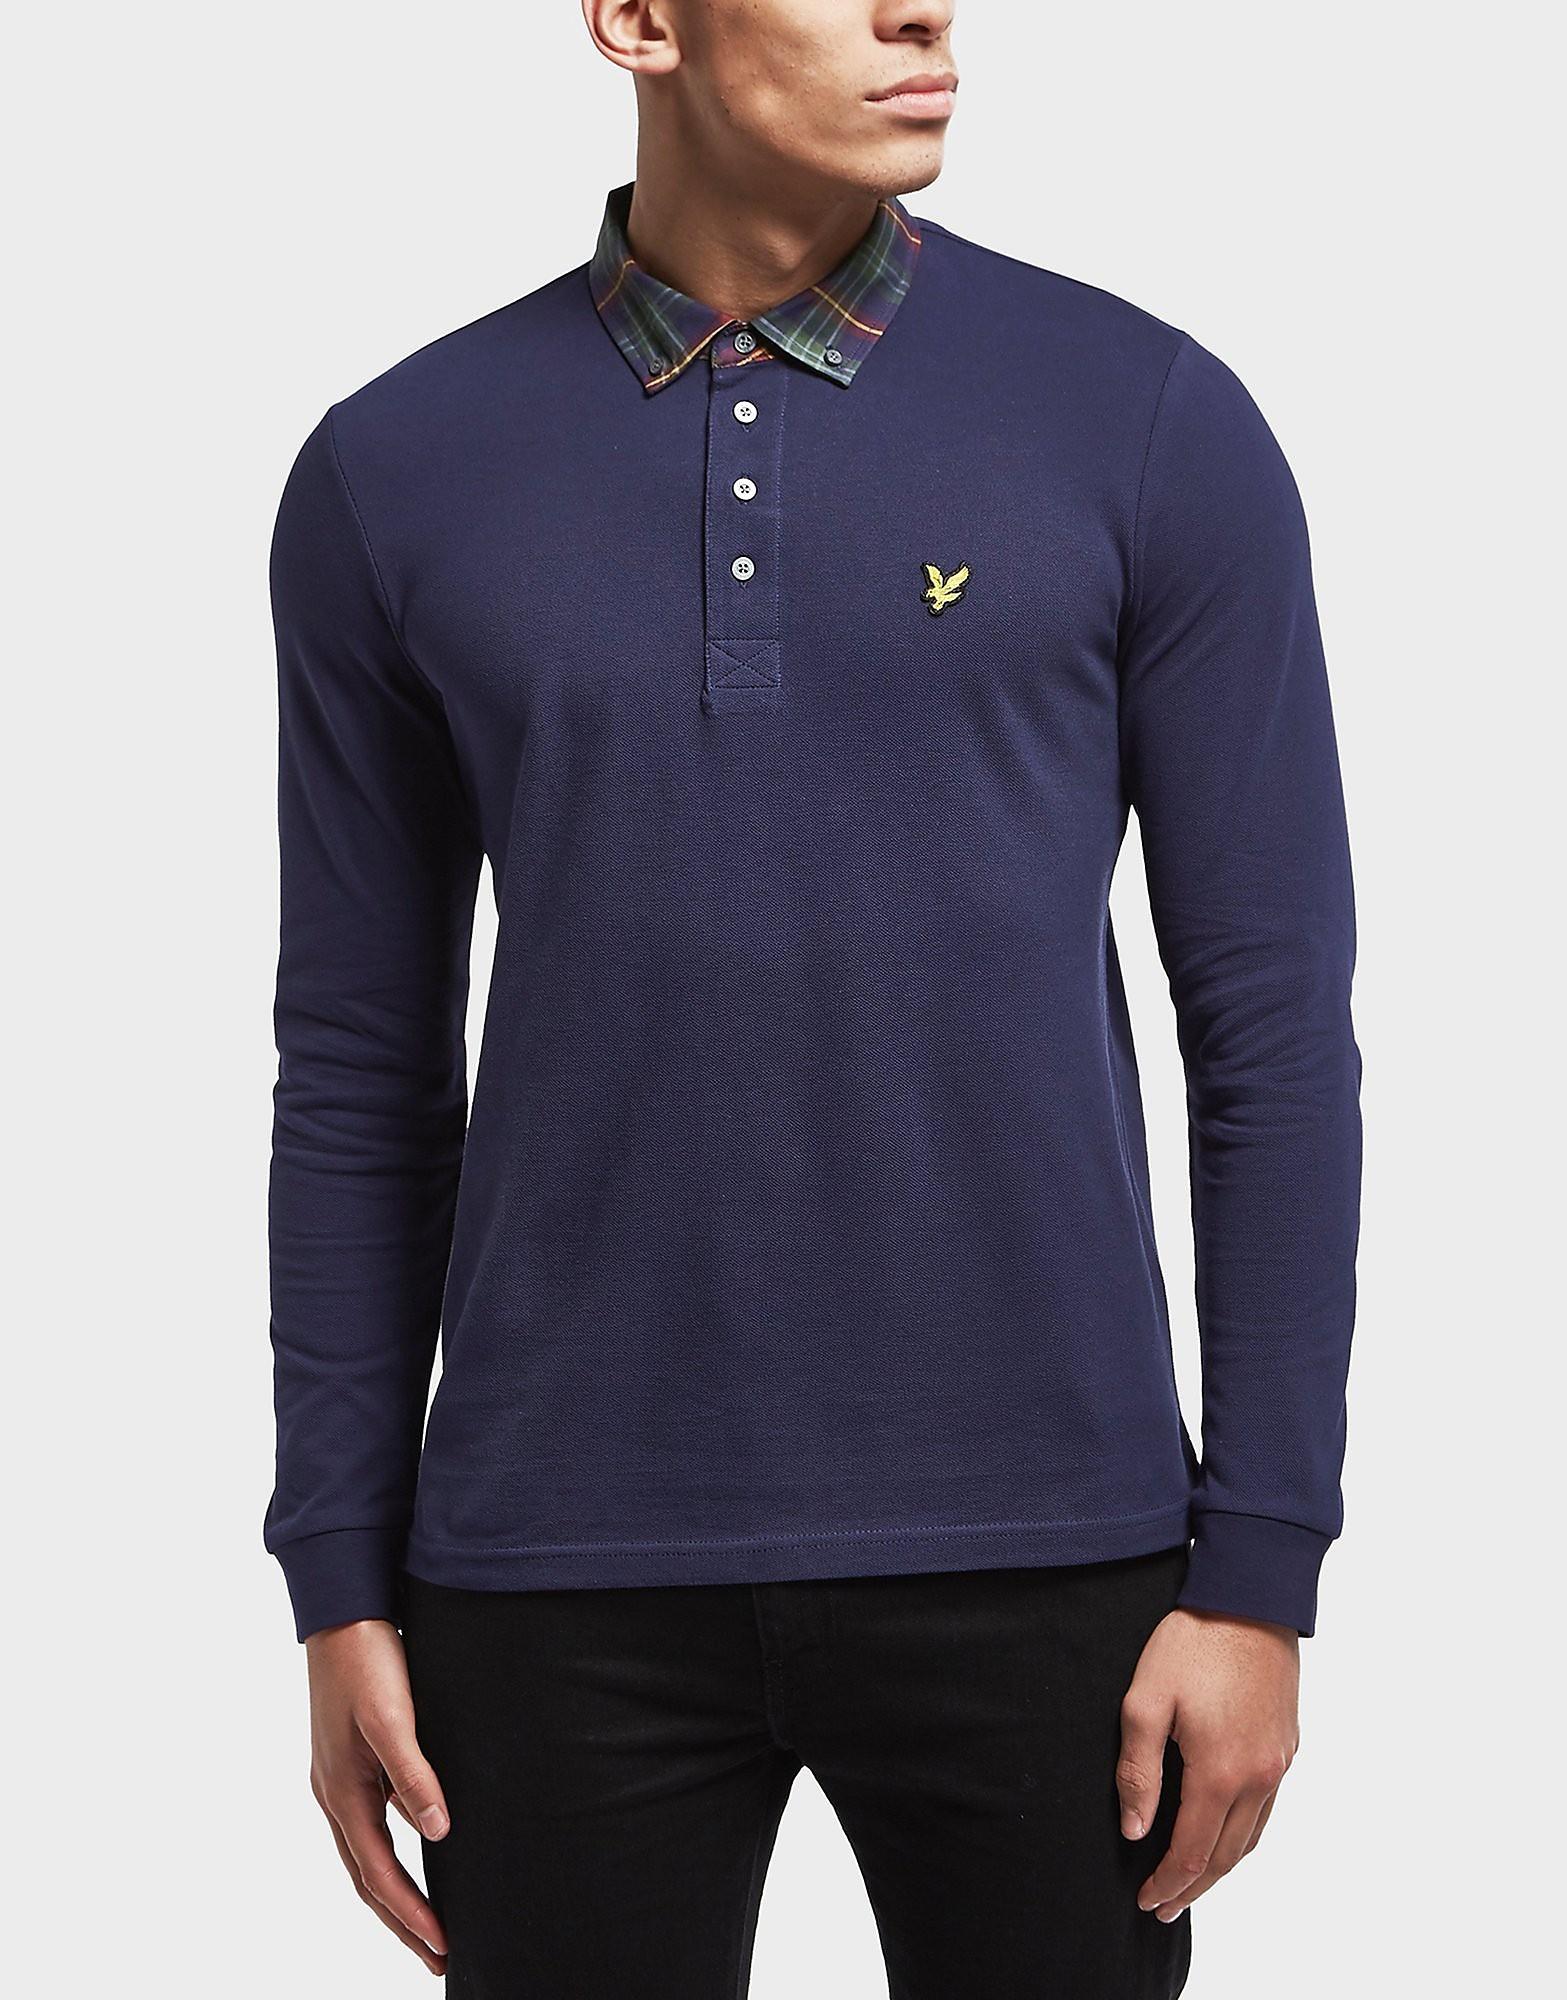 Lyle & Scott Check Collar Long Sleeve Polo Shirt - Exclusive